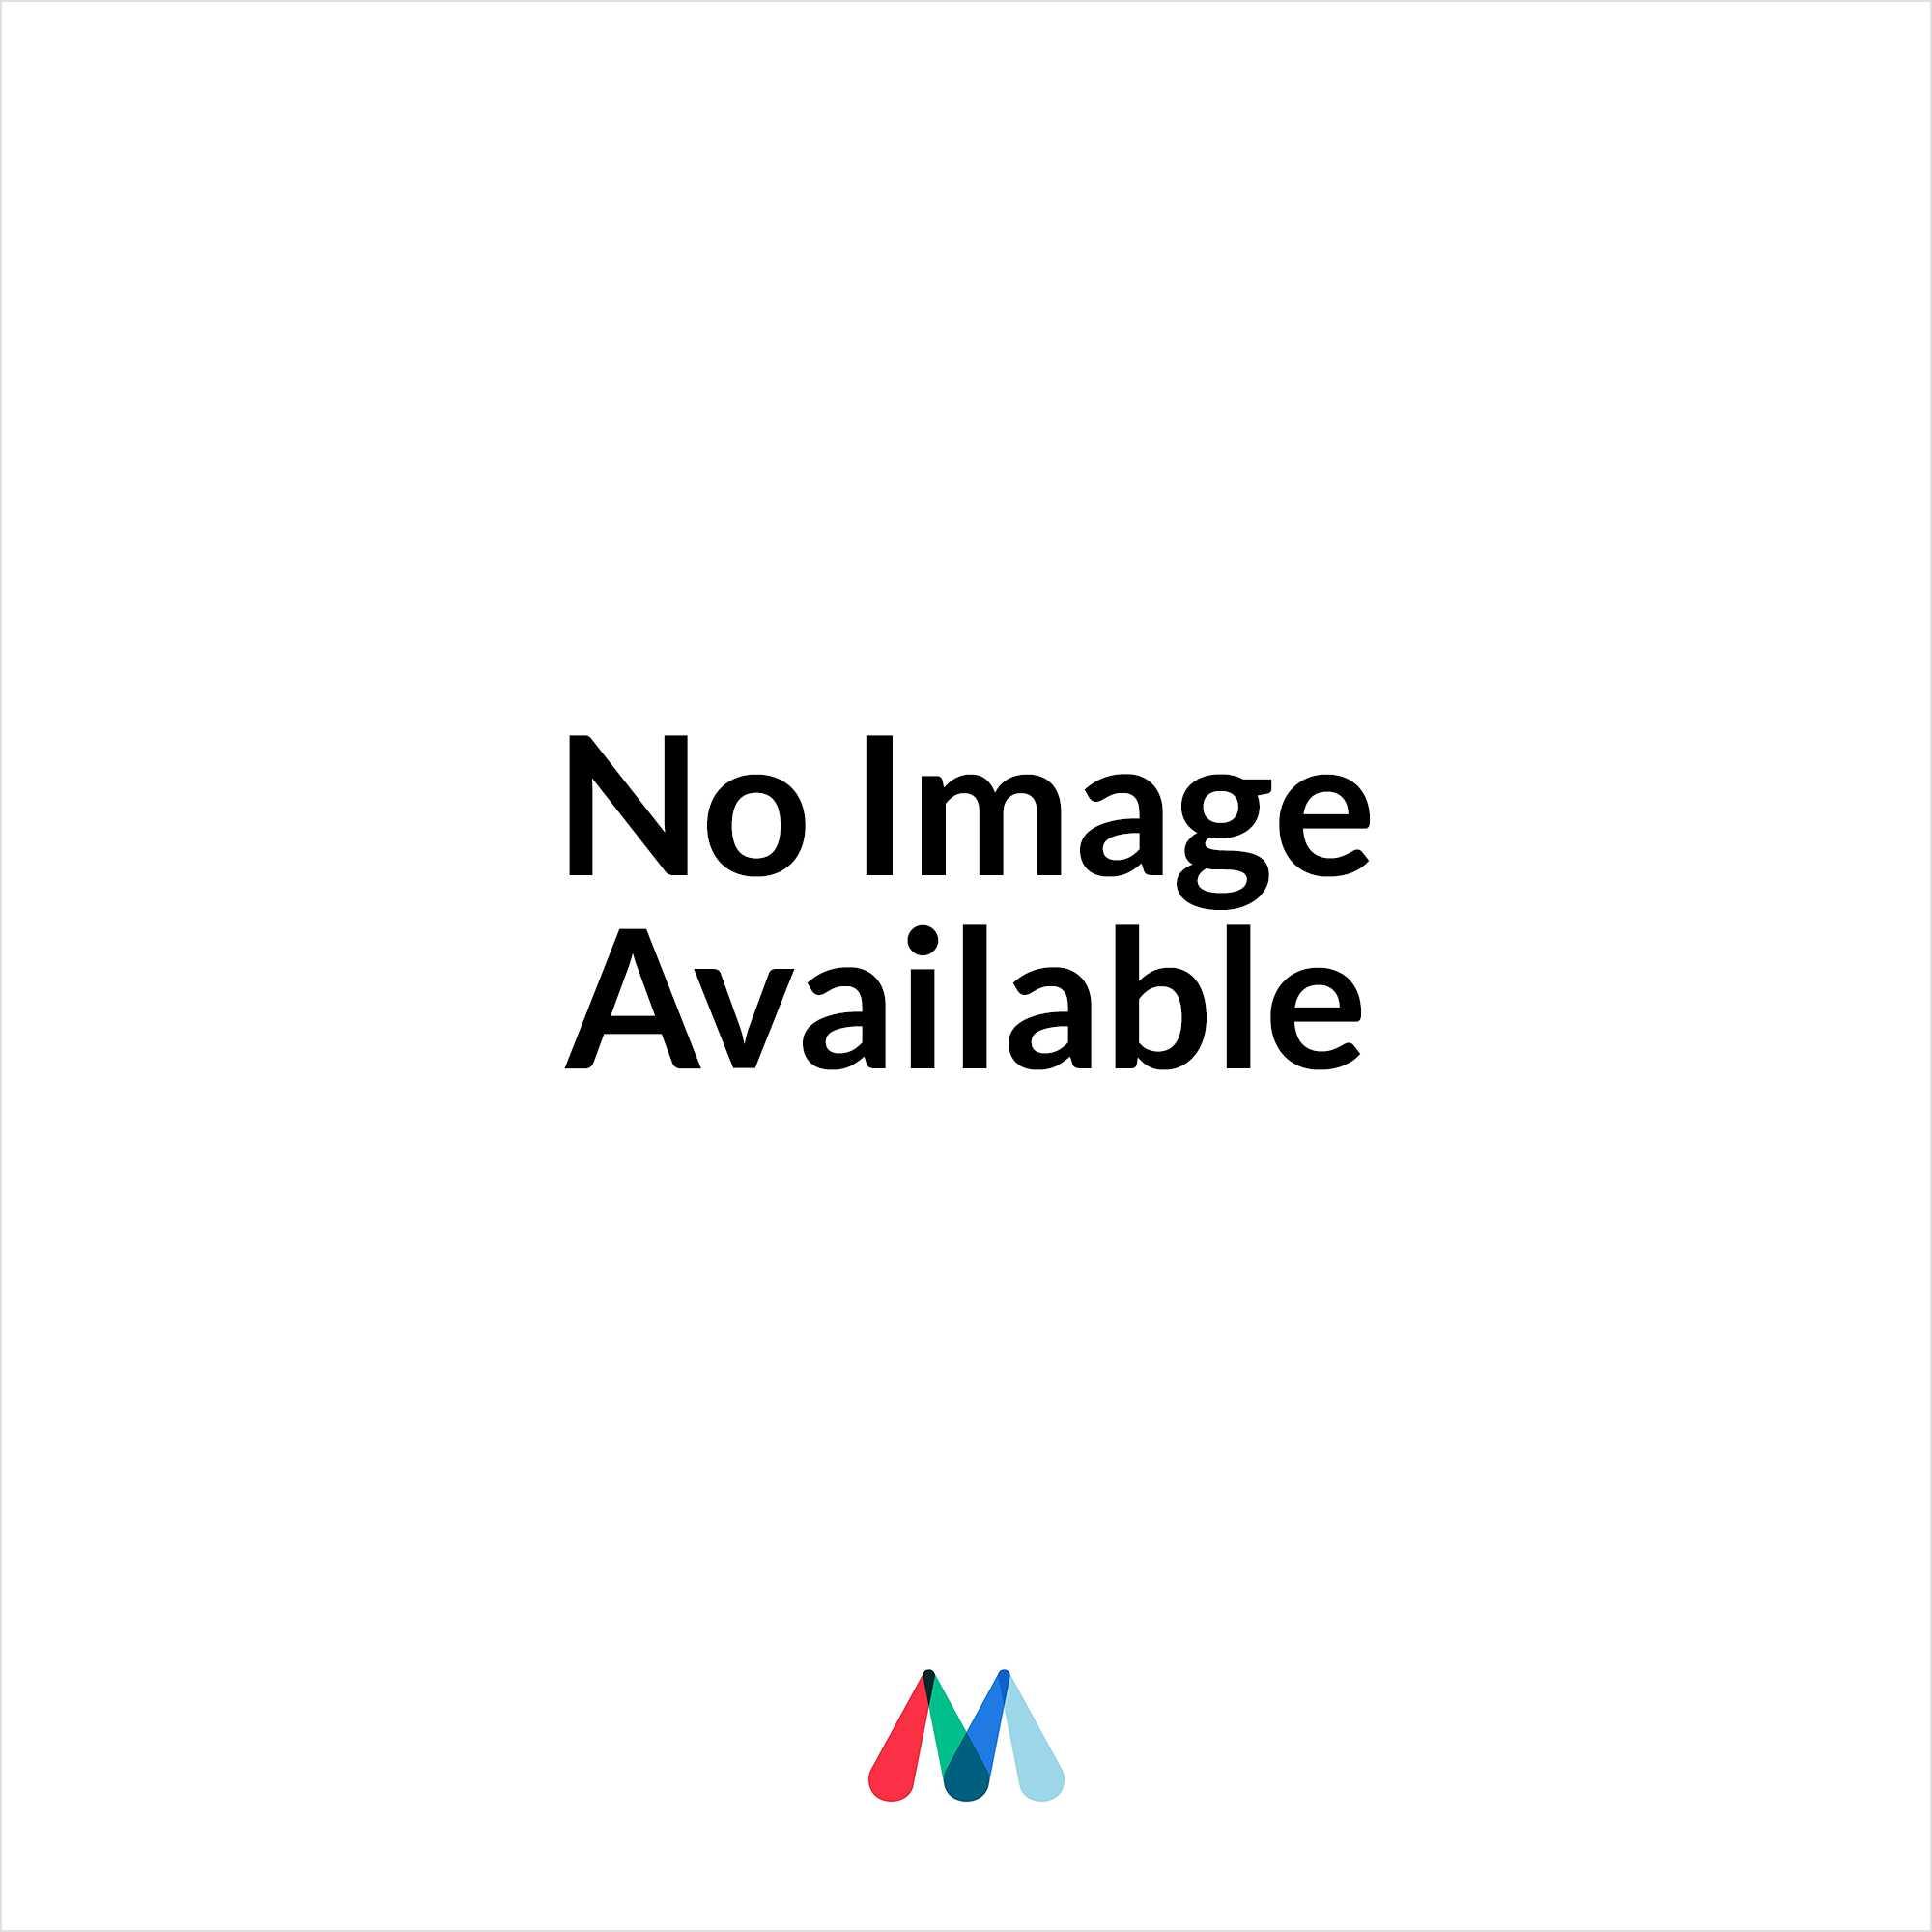 Collingwood Lighting LL030CARGB Colour change LED unit (MR16 retro fit 23mm body) 3w - Aluminium - Low voltage